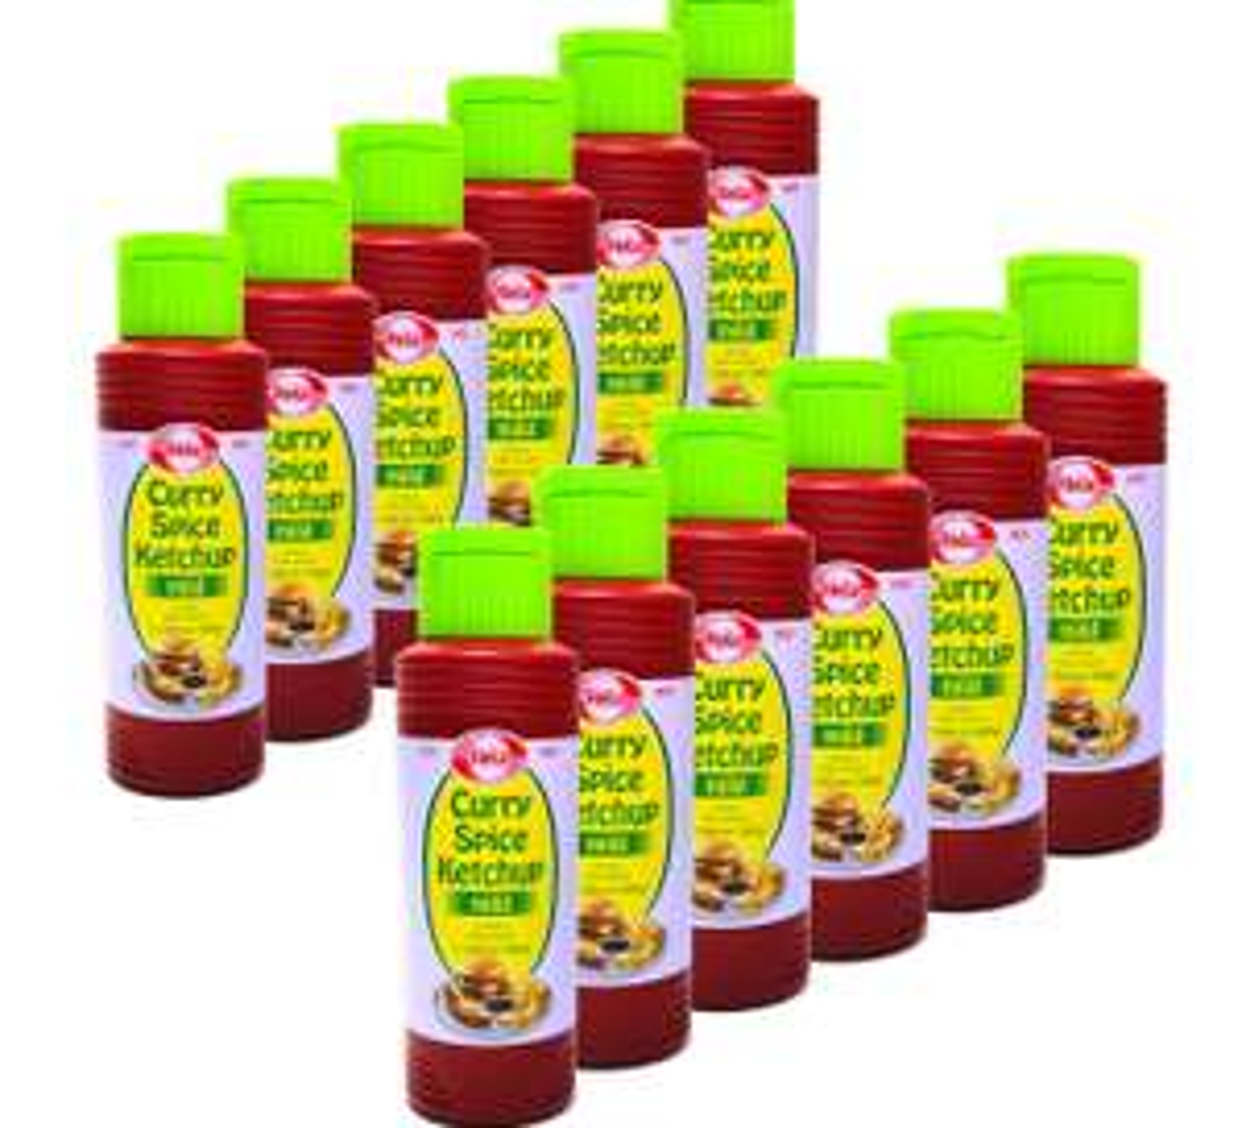 12x Hela Curry Gewürz Ketchup delikat 300ml [EU Ware] für 8,88€